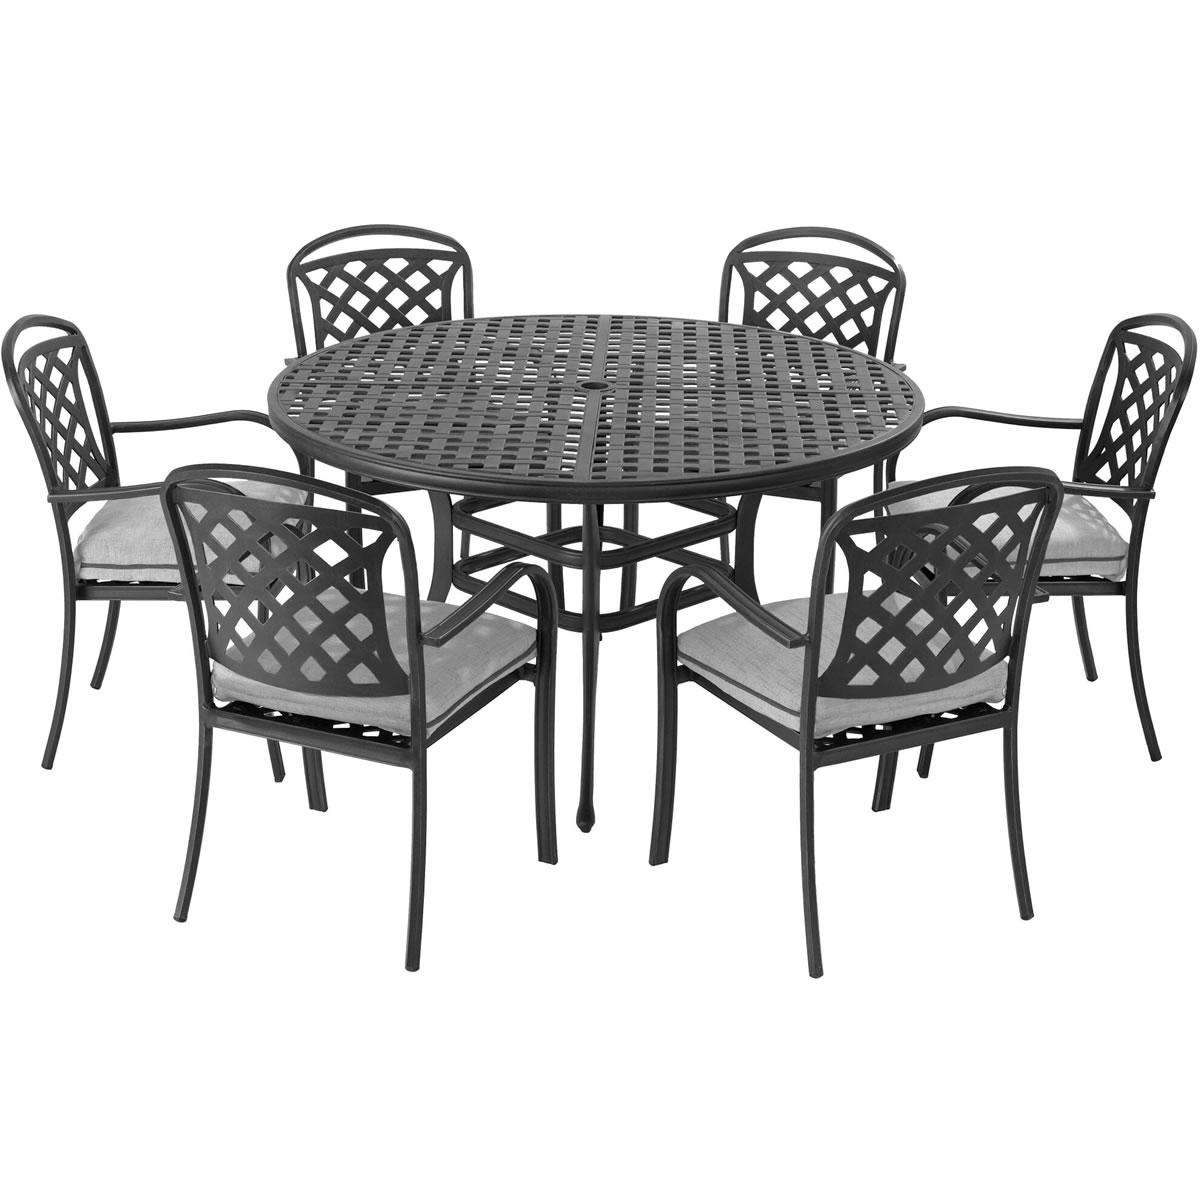 Metal Garden Table And Chair Sets Uk: Berkeley Cast Aluminium 6 Seater Round Garden Dining Set